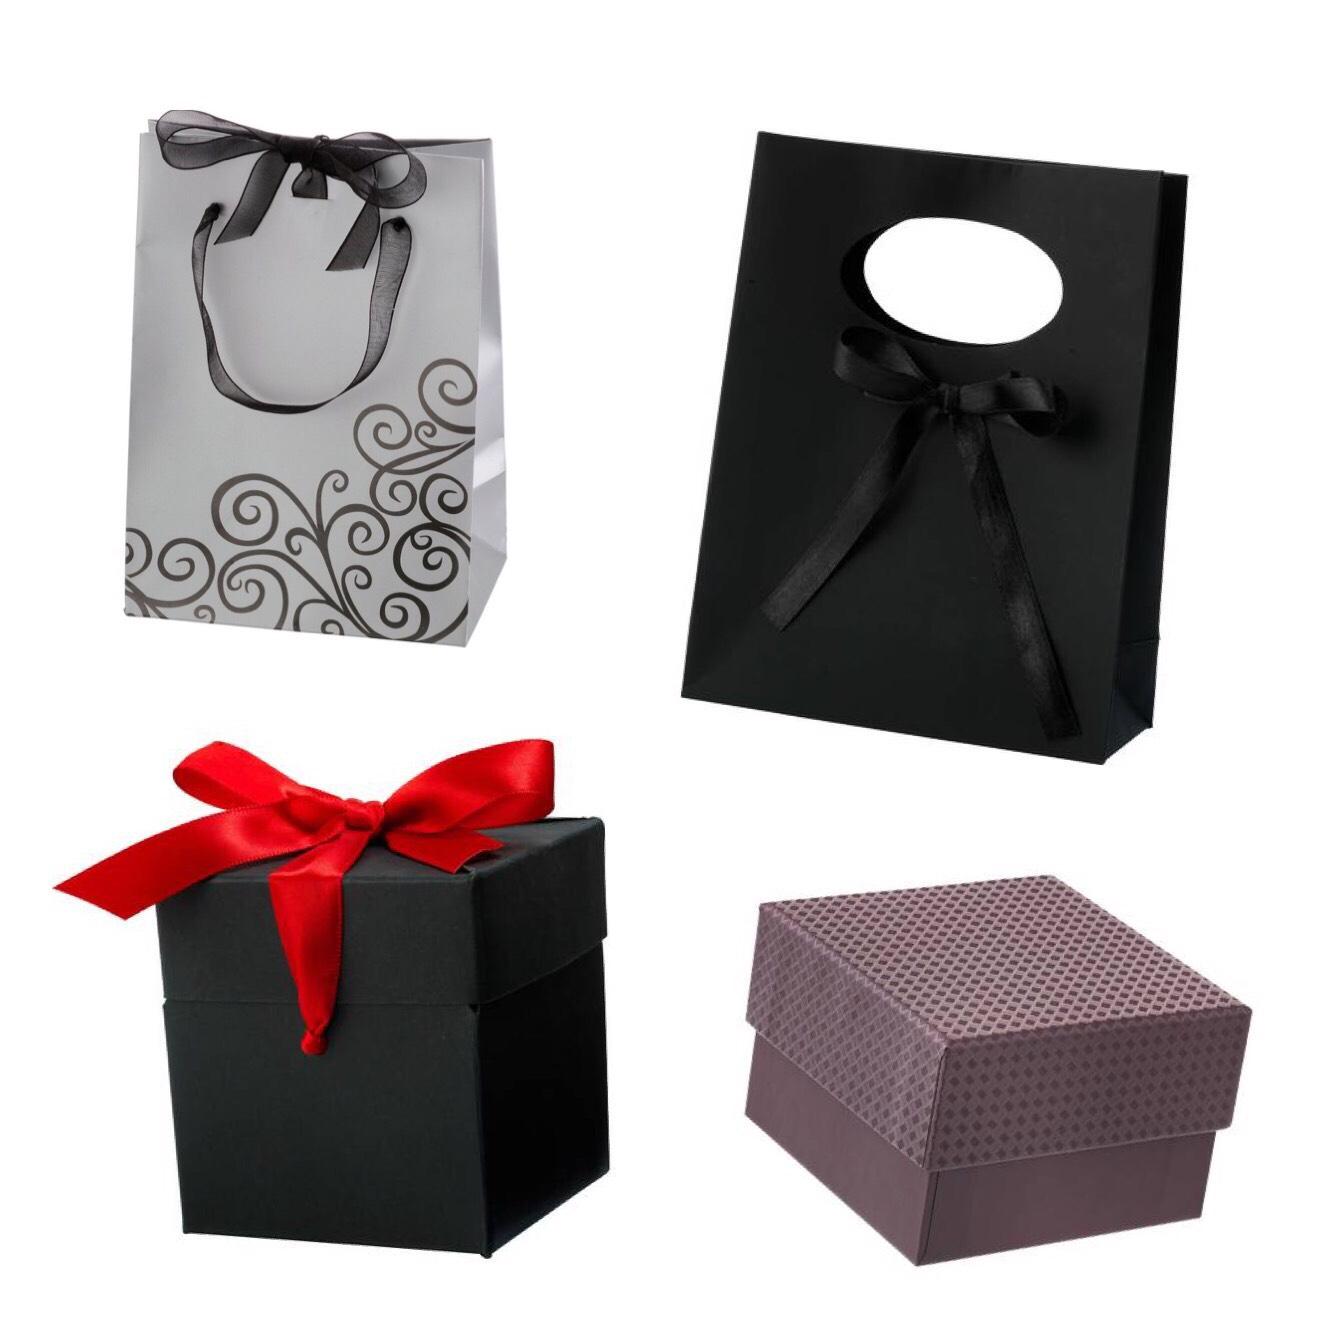 various gift bags boxes 50p argos hotukdeals. Black Bedroom Furniture Sets. Home Design Ideas